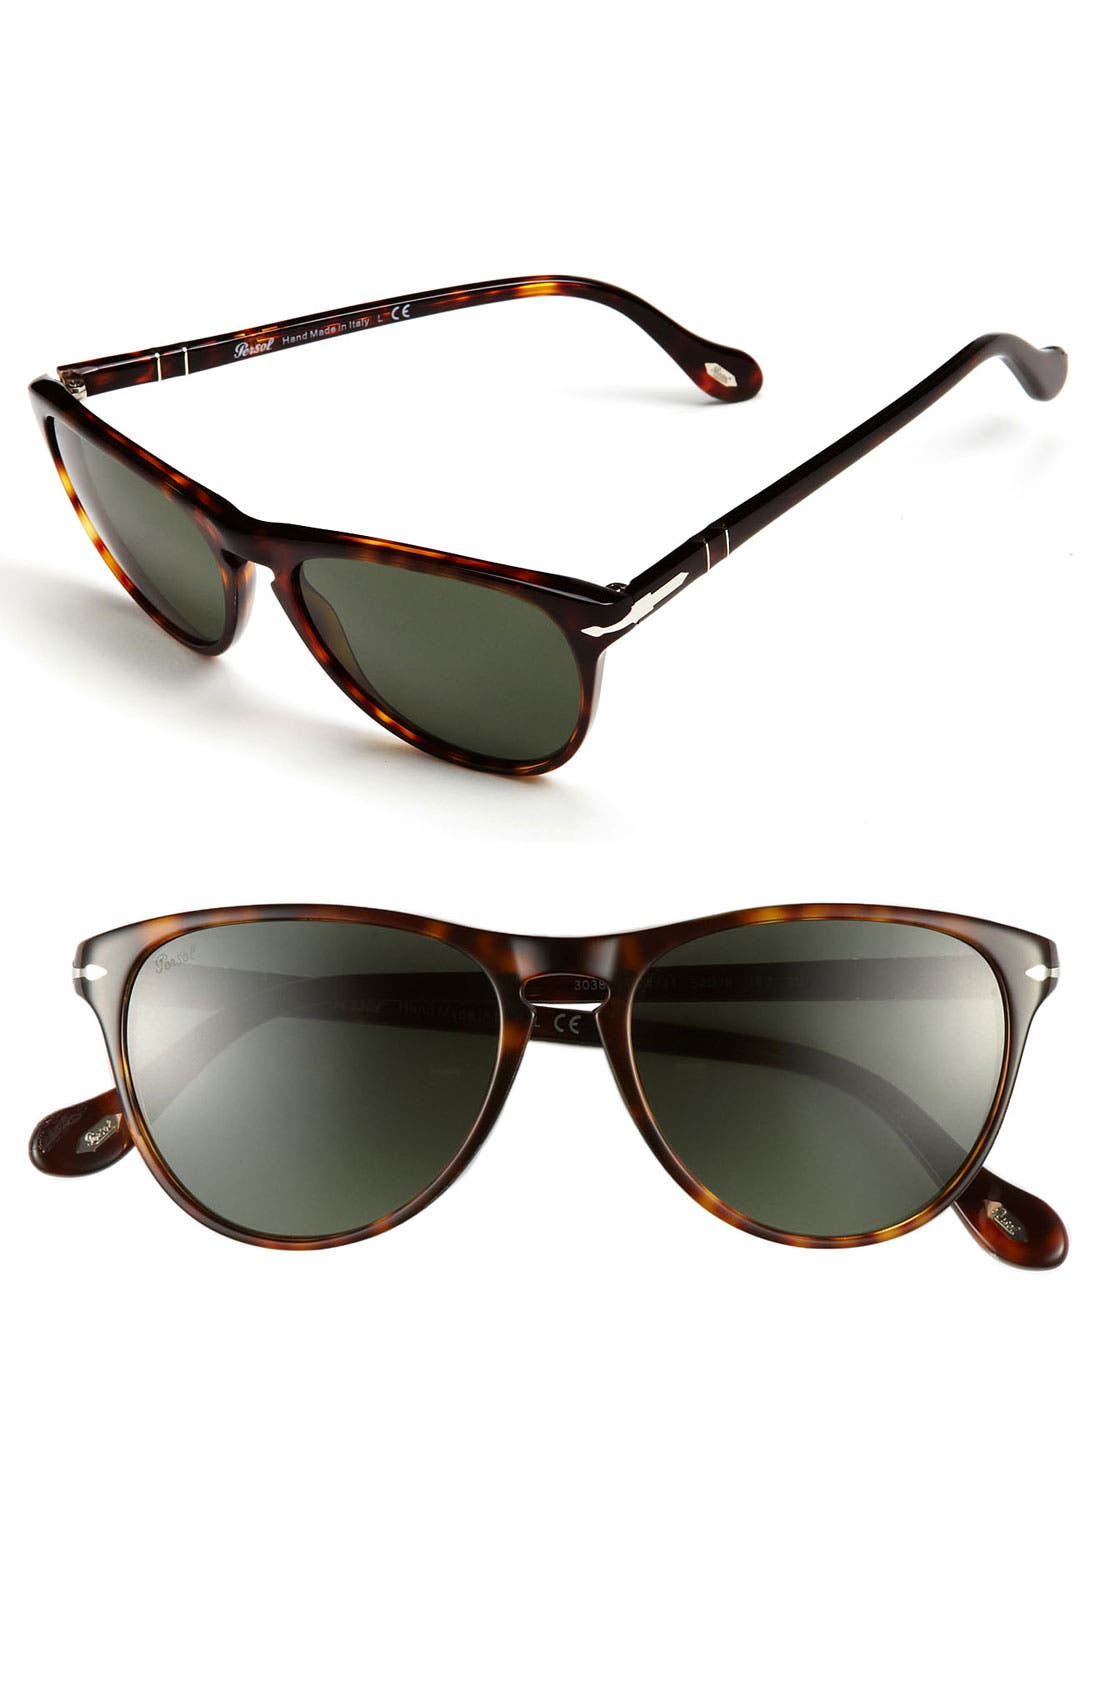 Alternate Image 1 Selected - Persol 'Suprema' 52mm Sunglasses